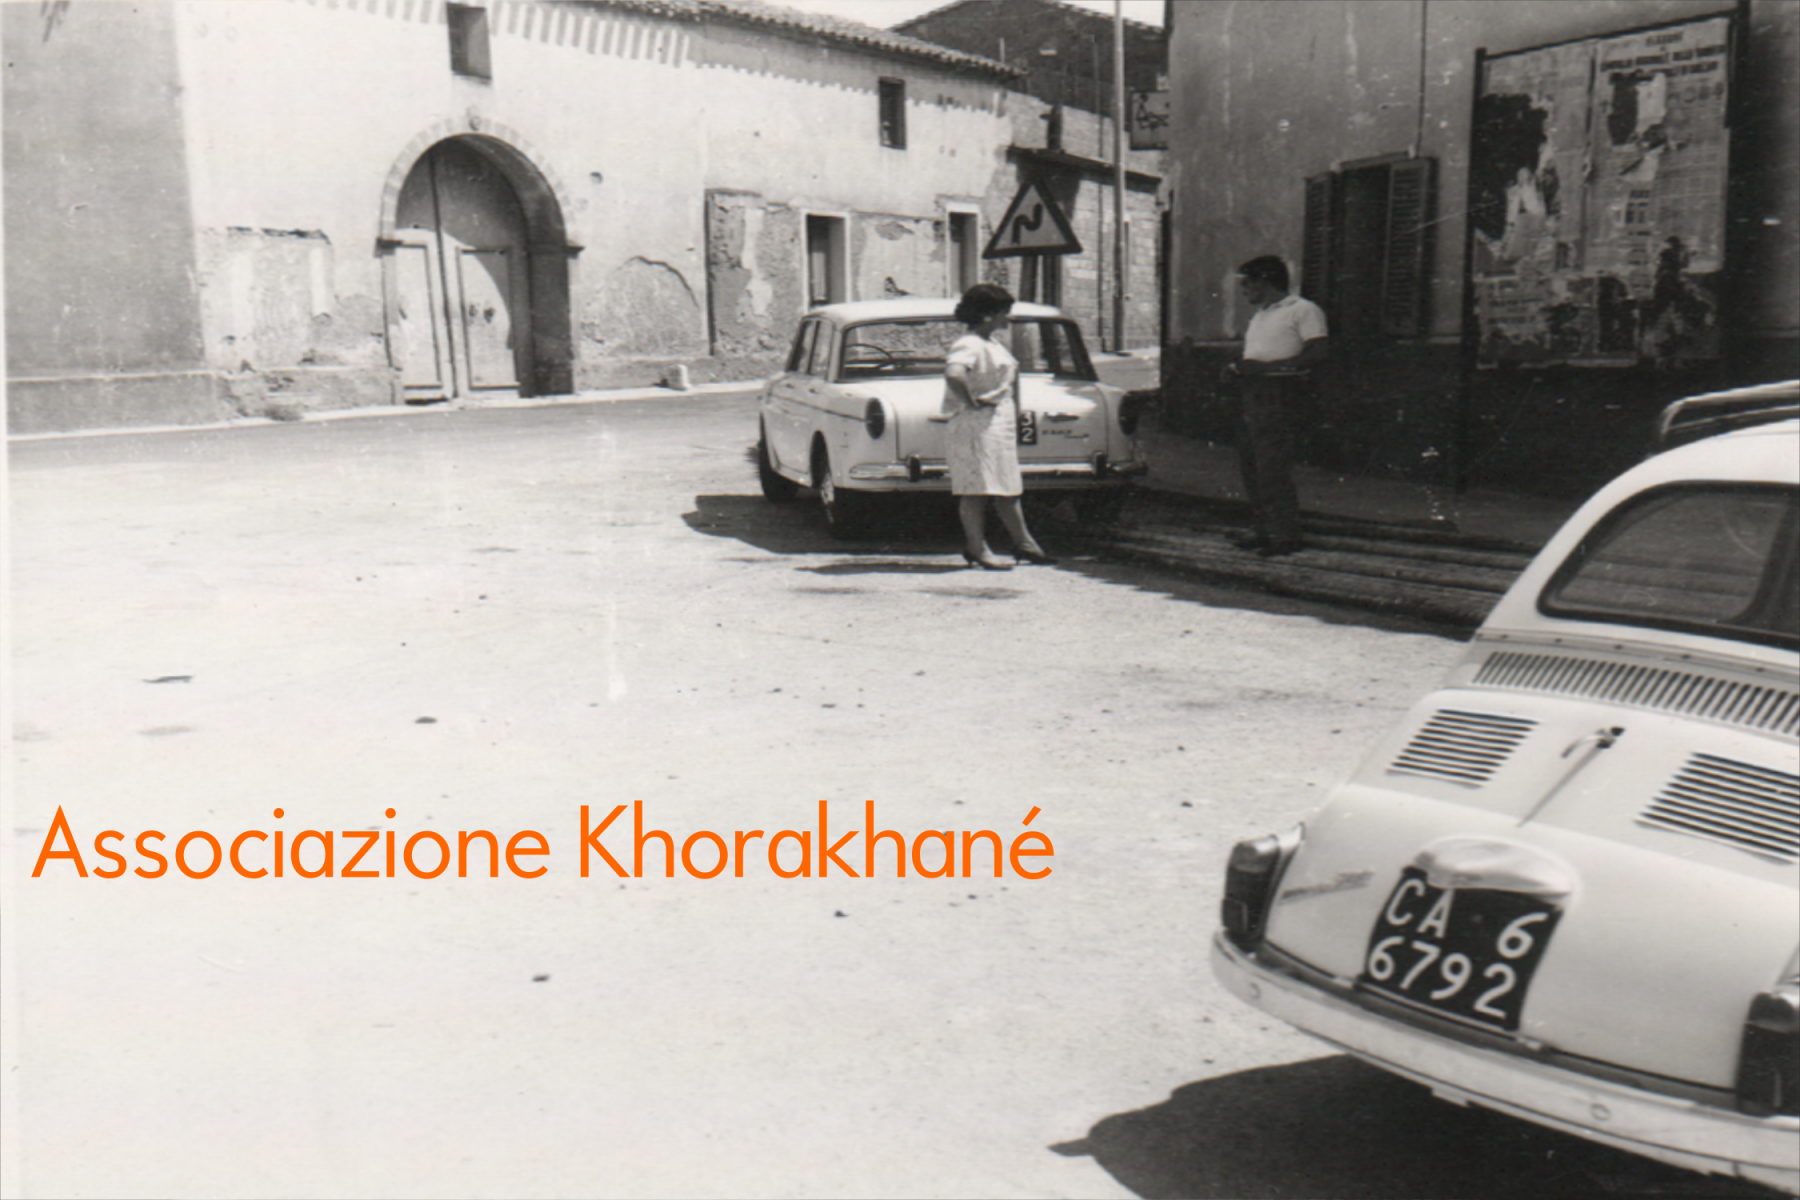 Associazione Khorakhané